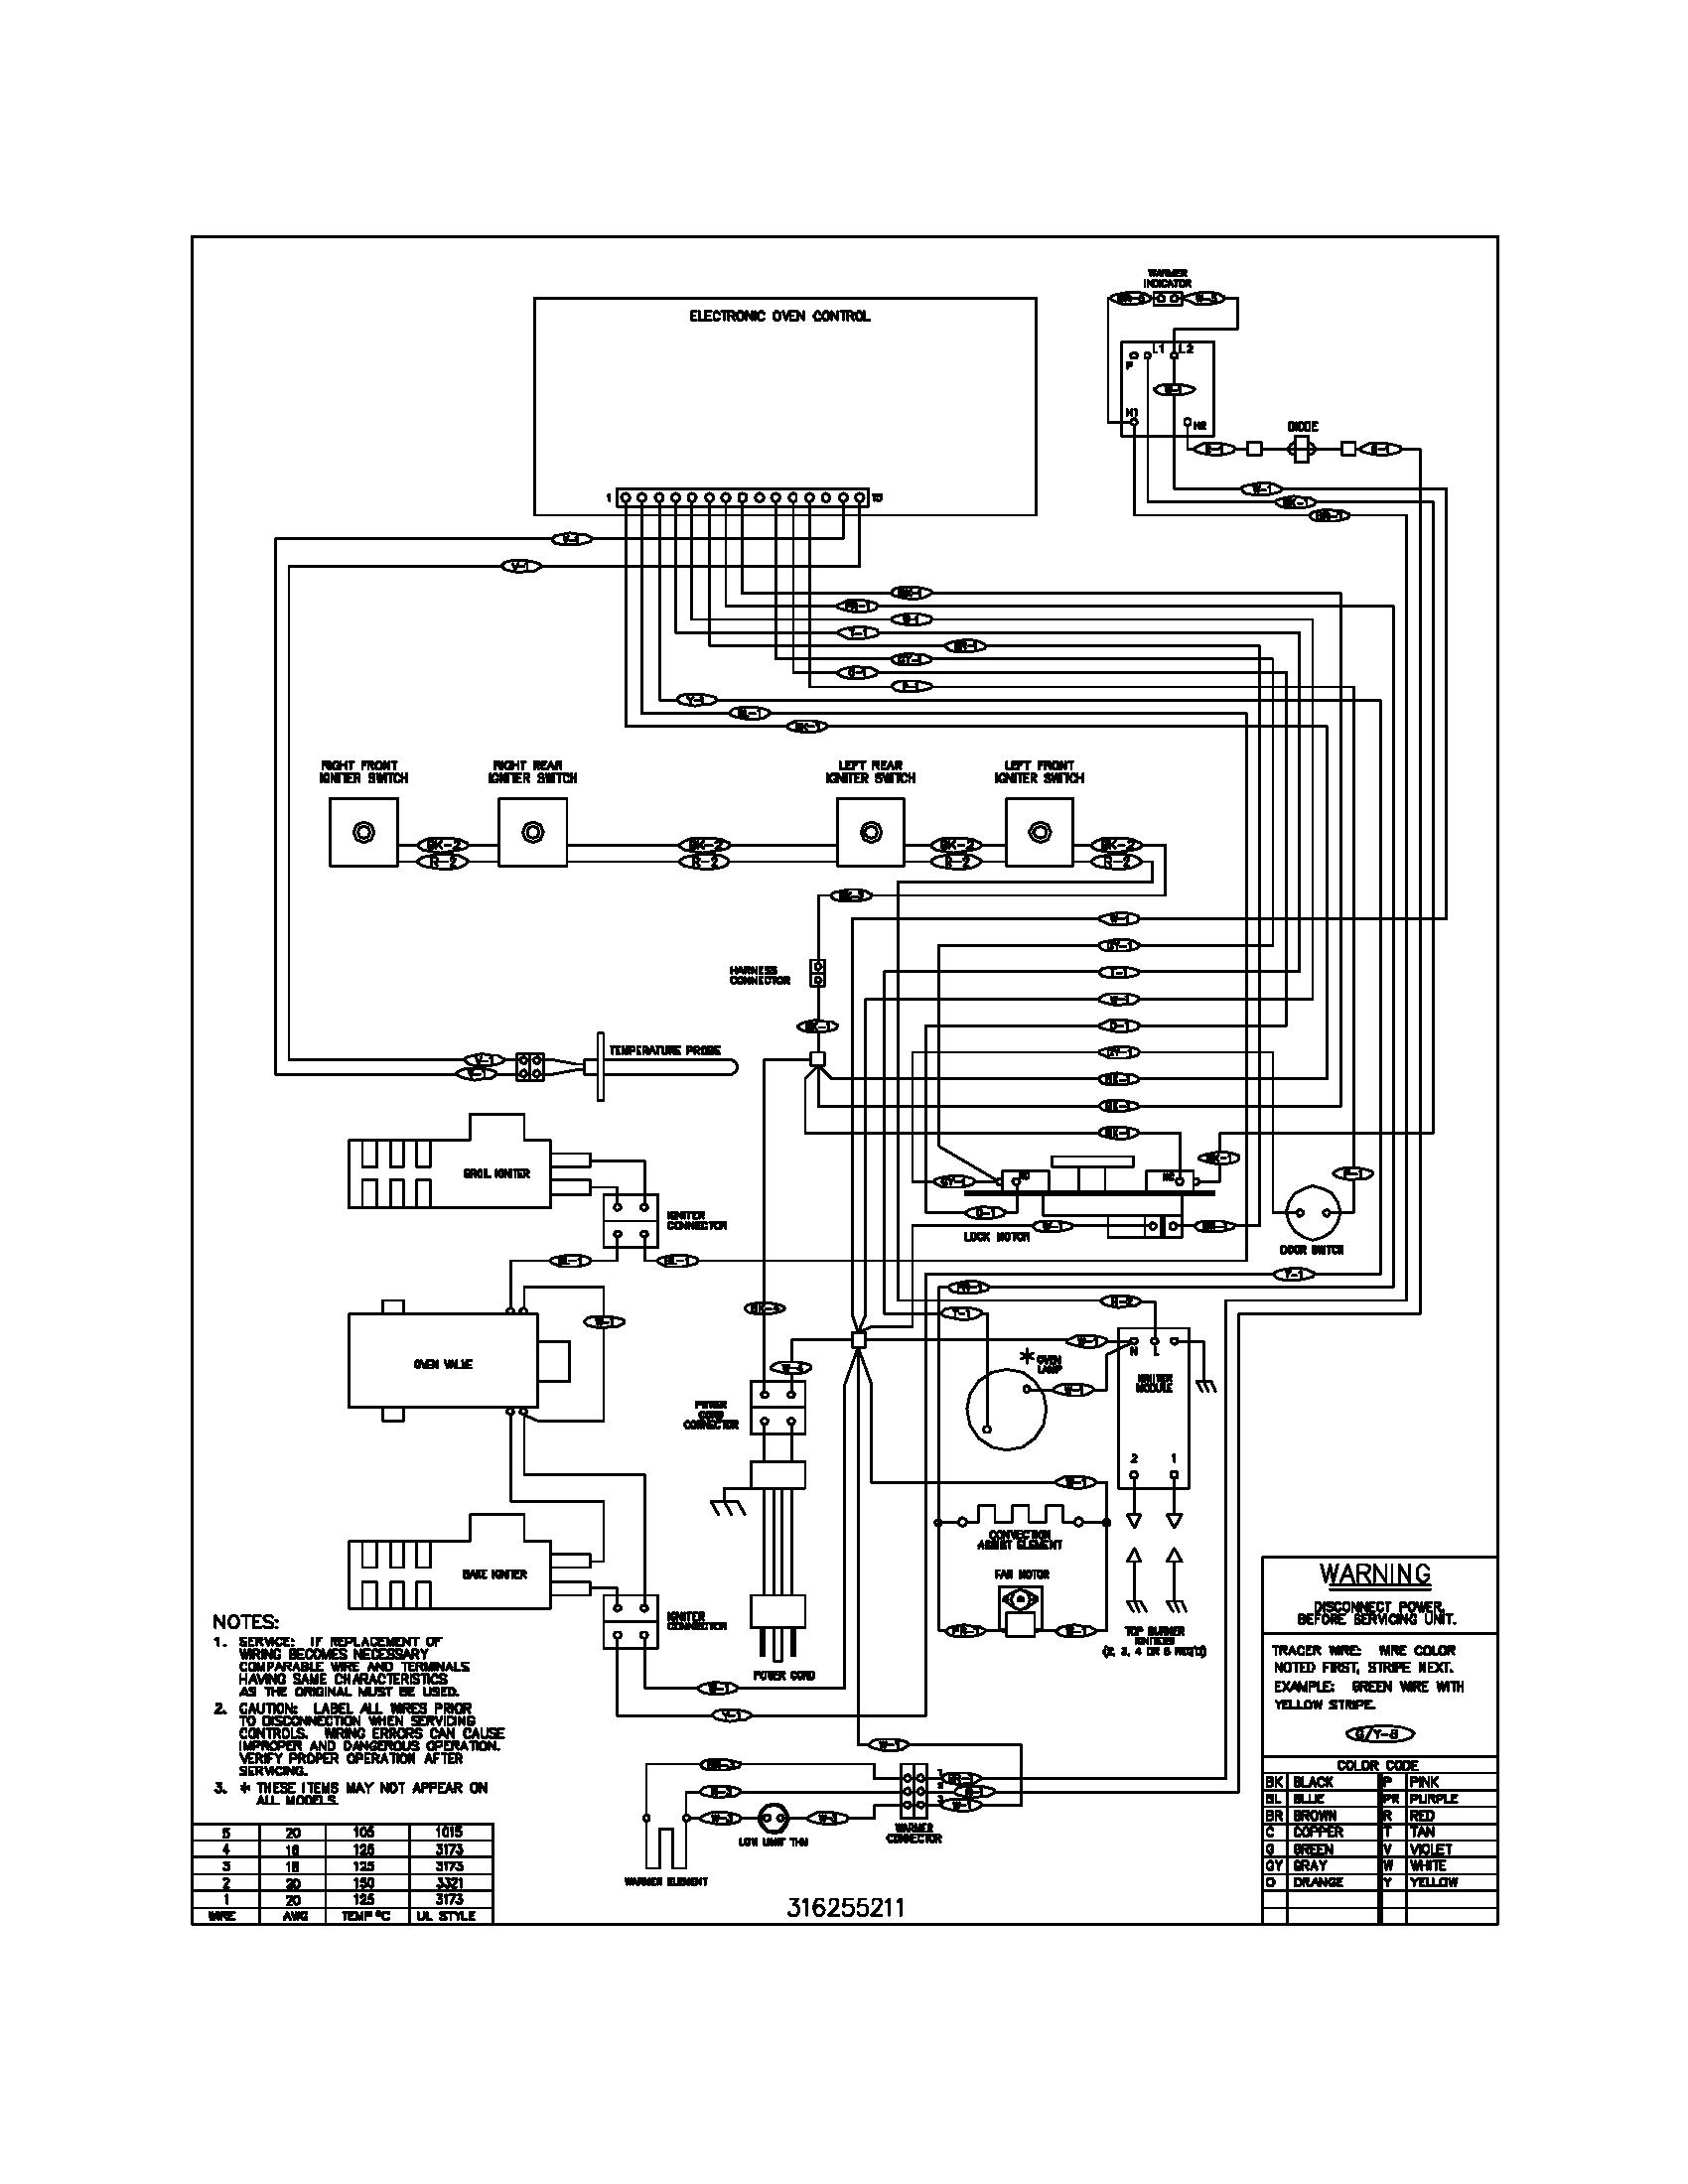 wiring diagram parts diagrams 14801212 lennox wiring diagrams wiring diagram for lennox signature stat wiring diagram at gsmx.co